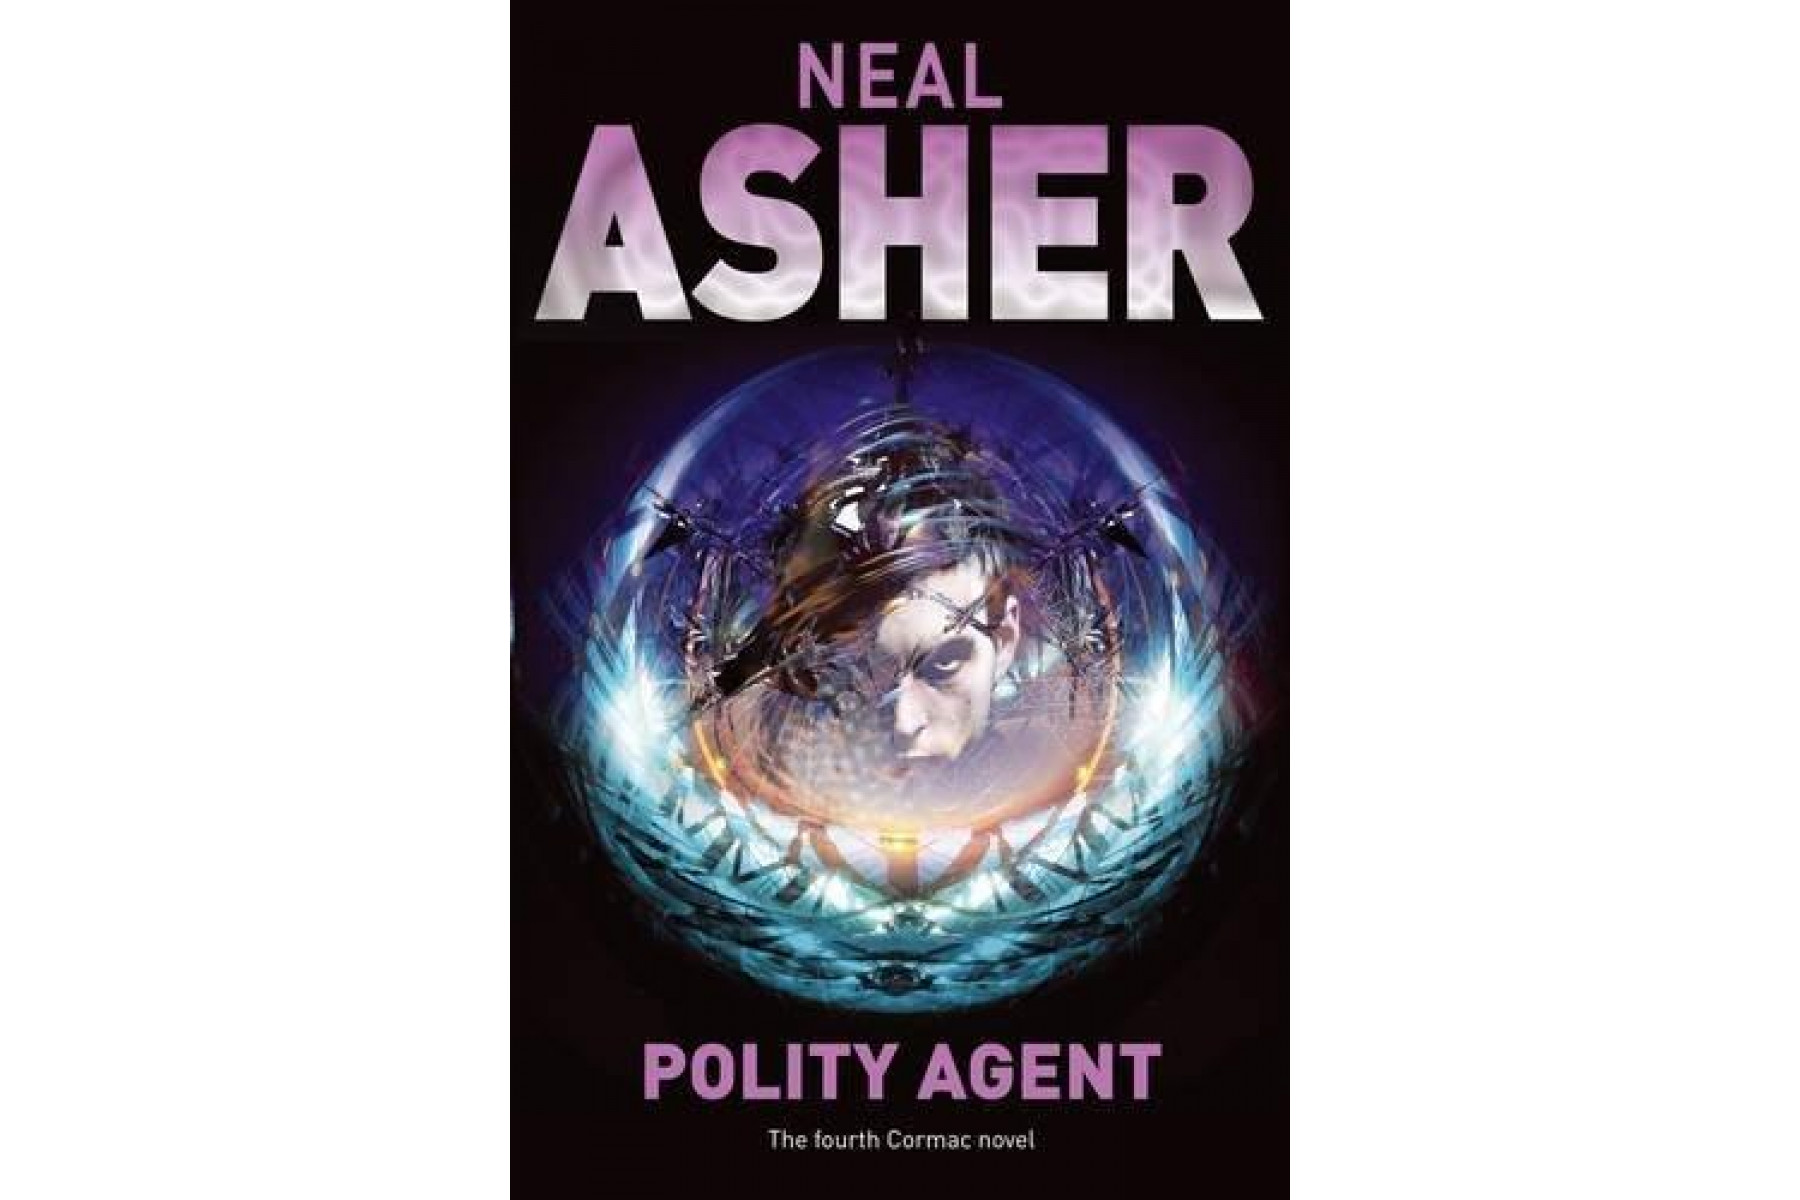 Polity agent